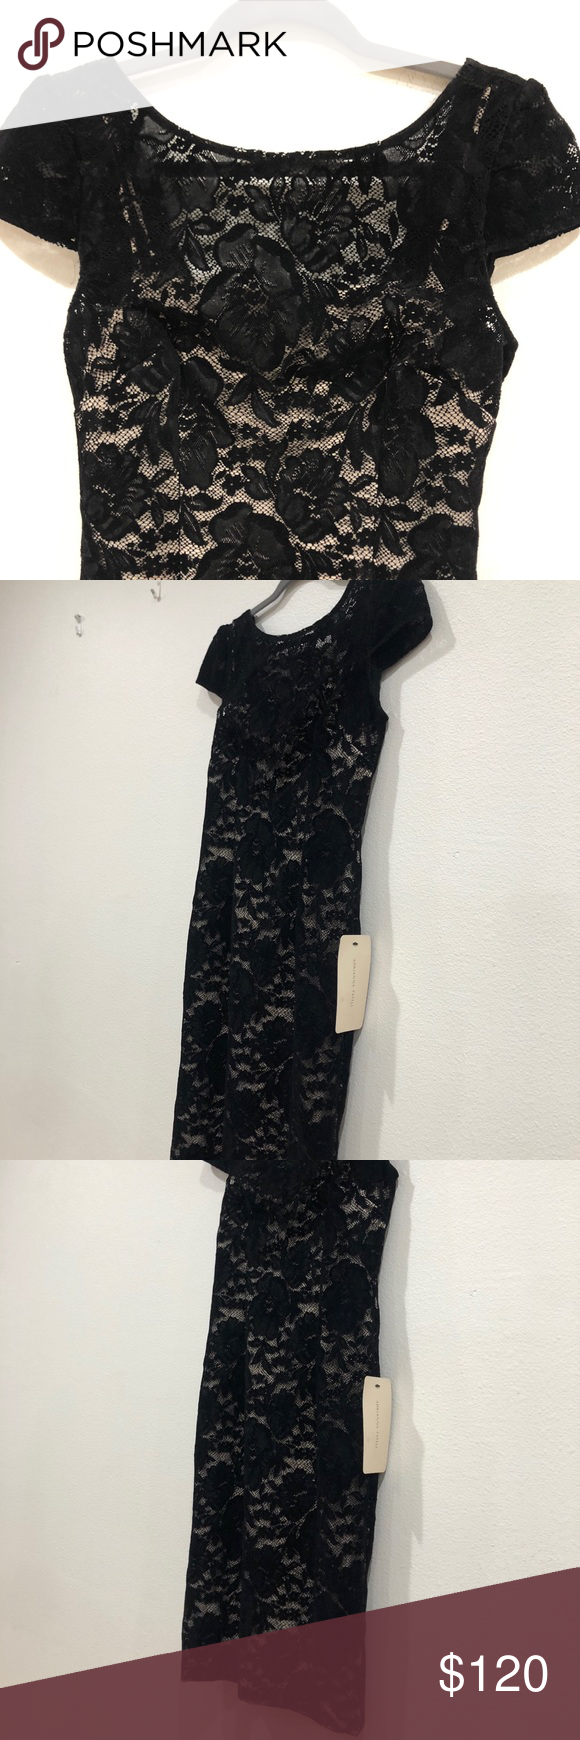 Black Lace Dress With Cream Lining Black Lace Dress Lace Dress Dresses [ 1740 x 580 Pixel ]